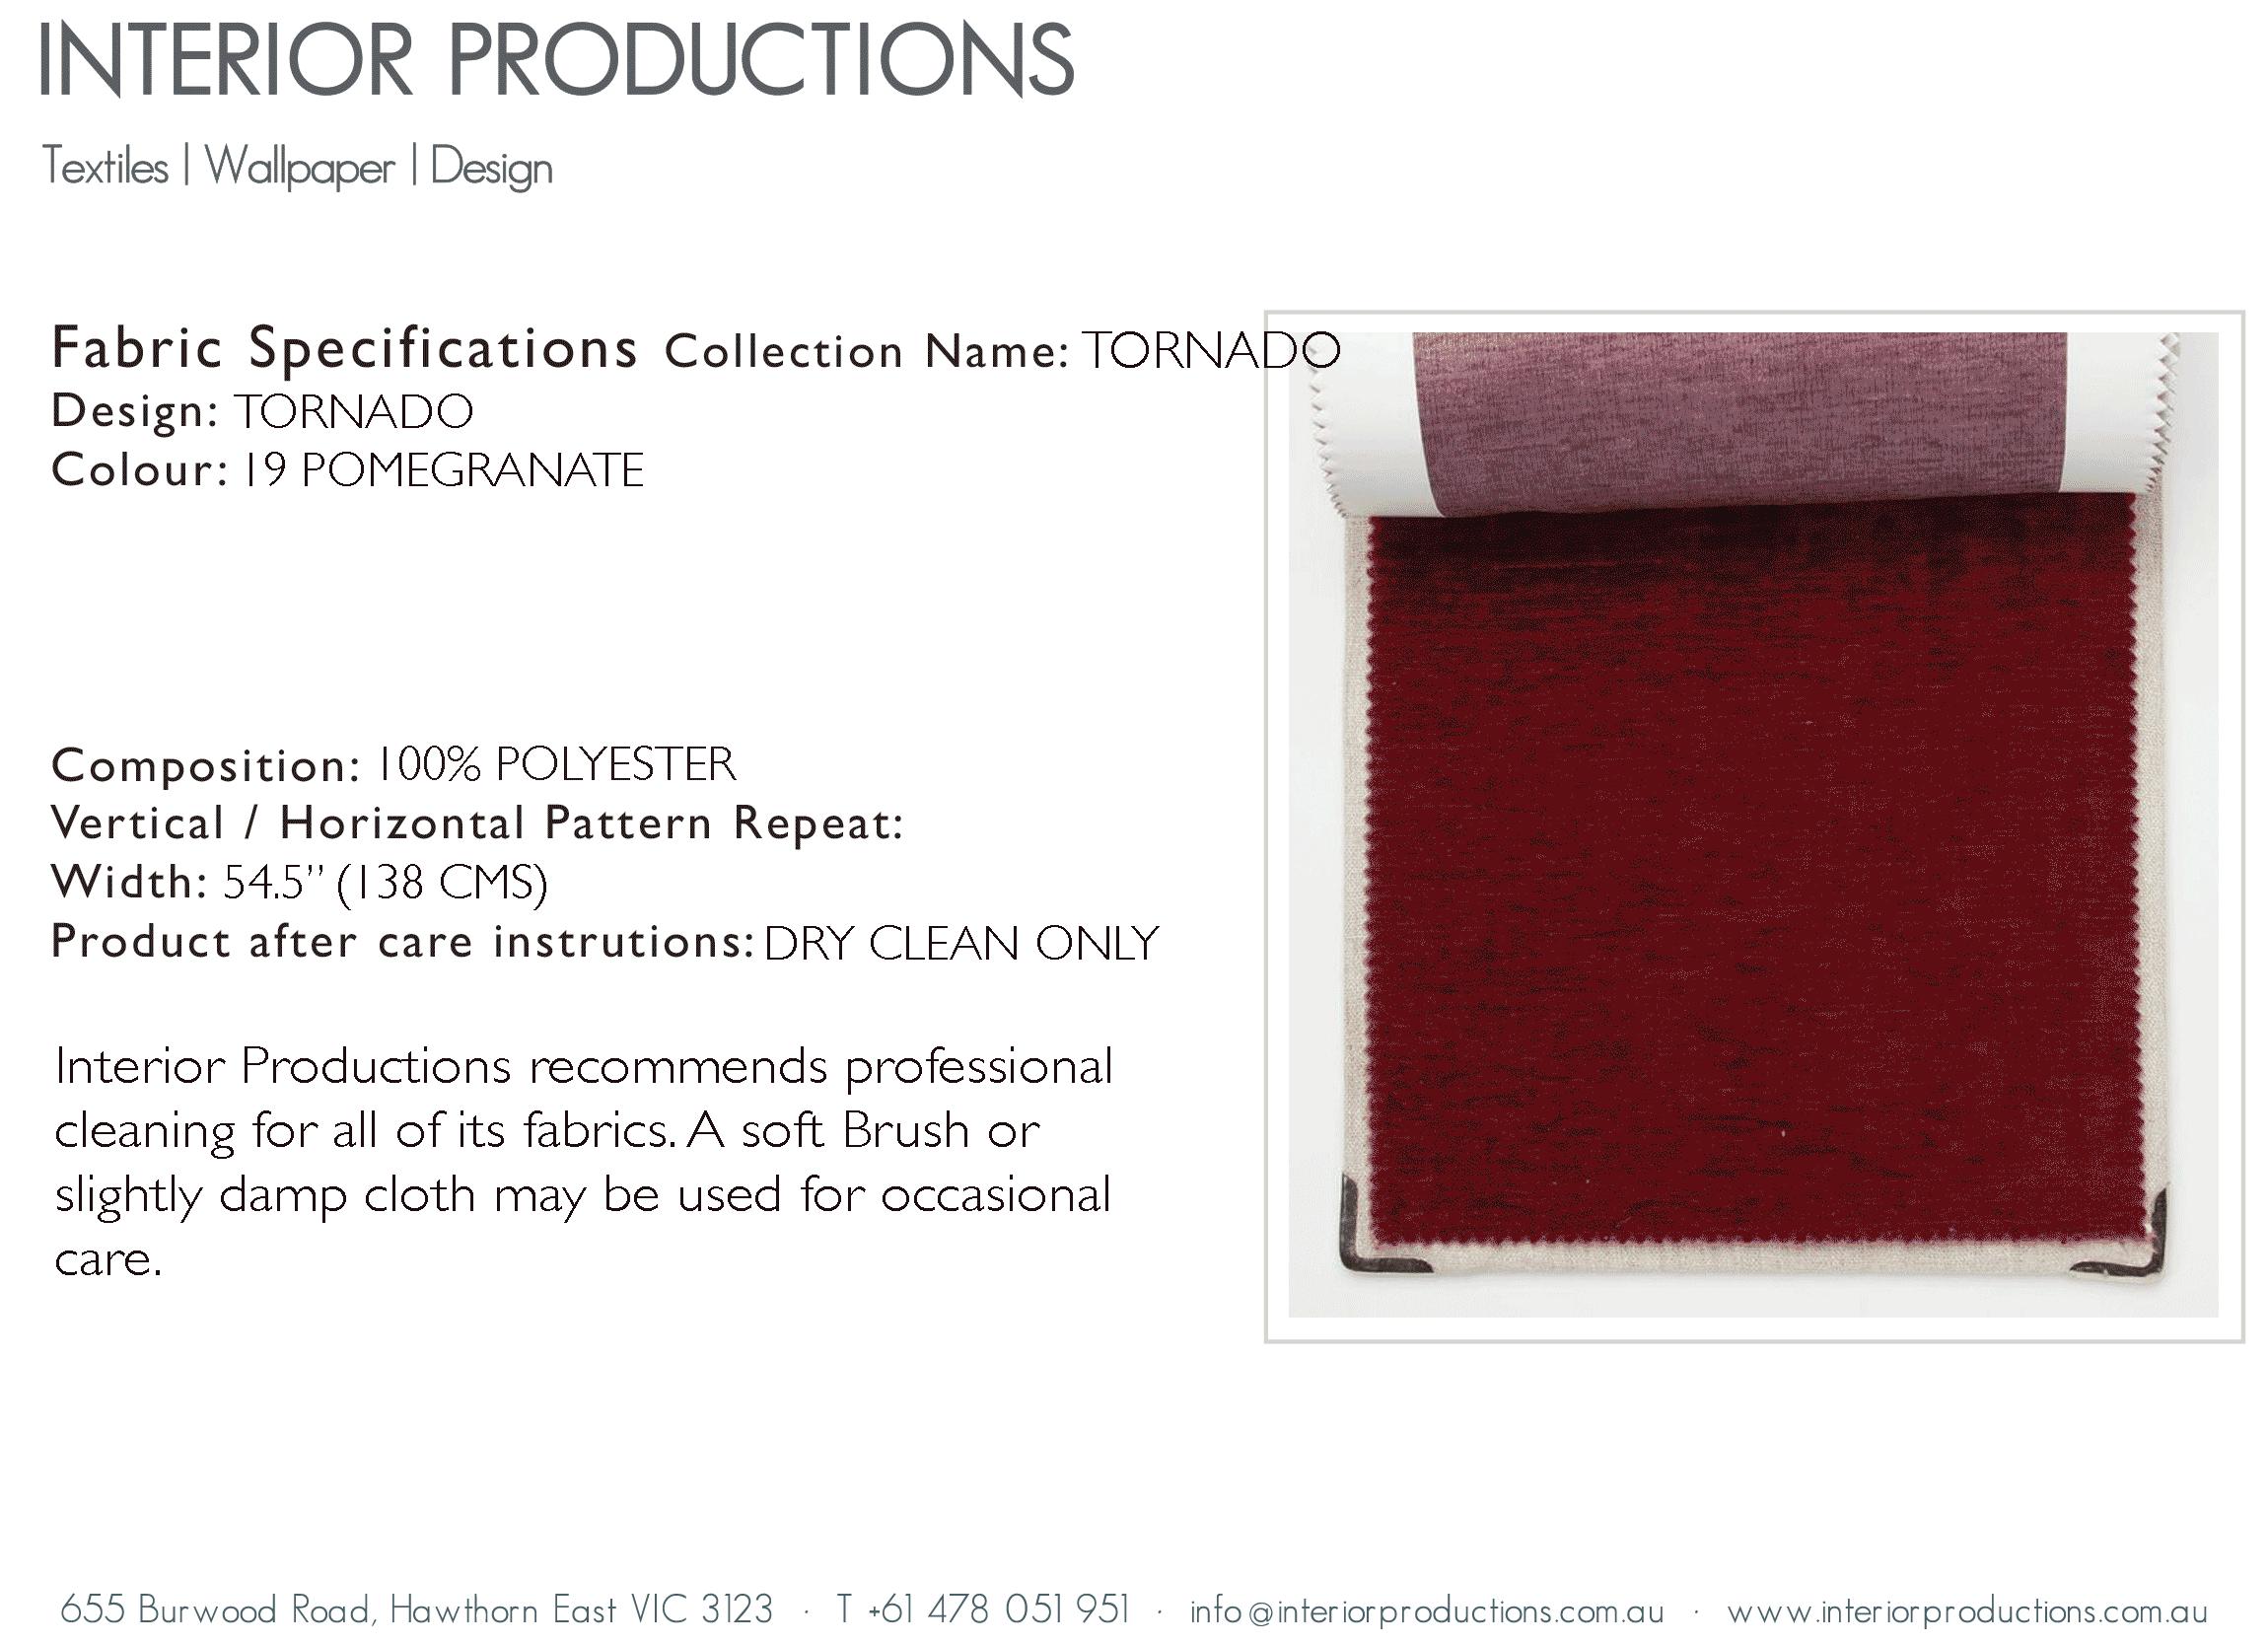 interior_productions_TORNADO---19-POMEGRANATE